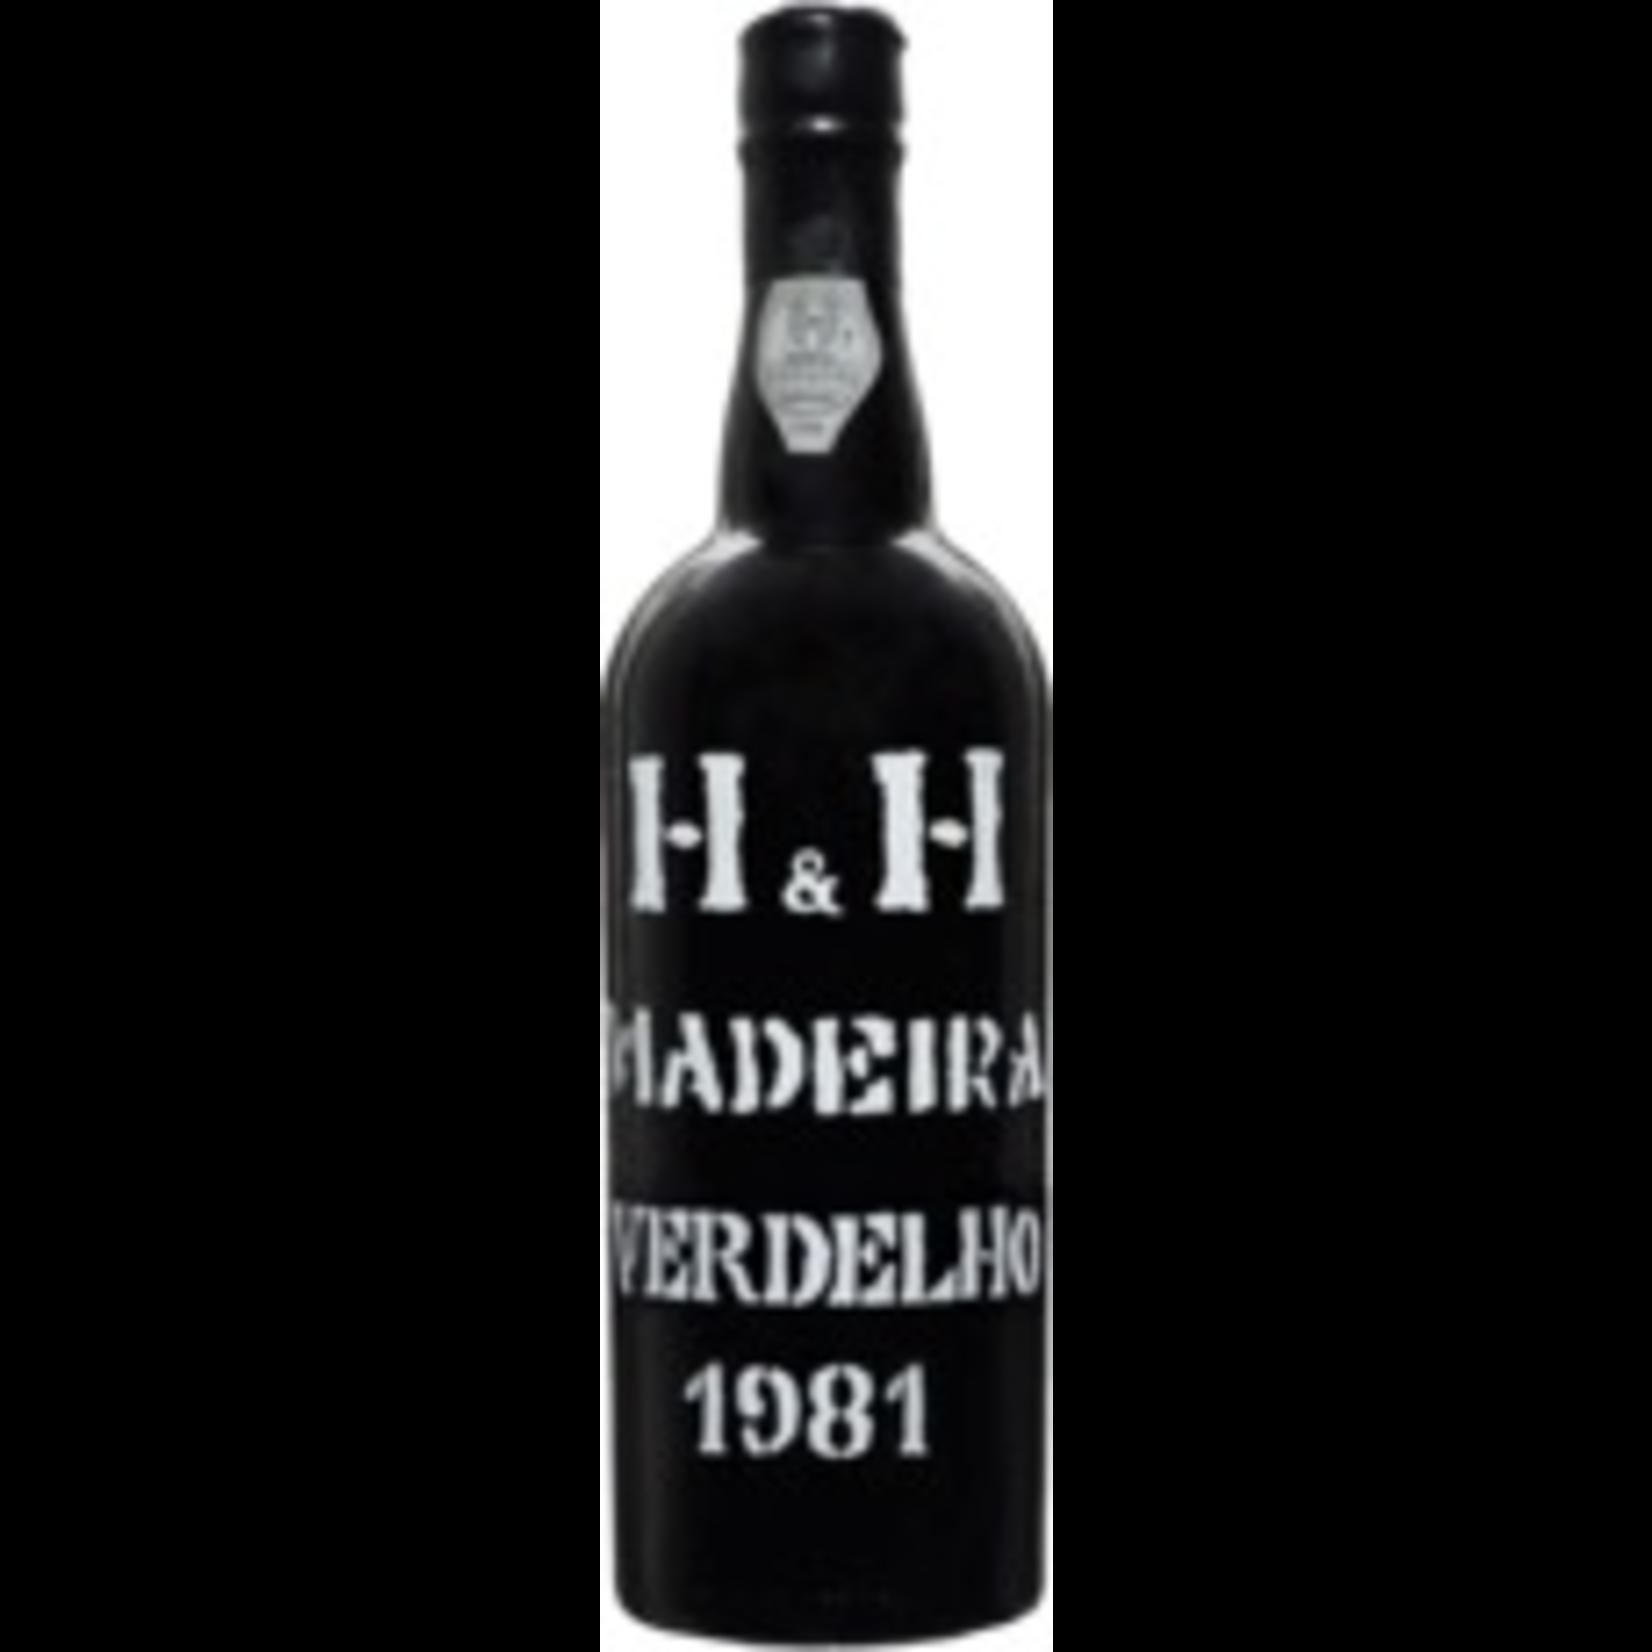 Wine Henriques and Henriques, 1981 Madeira Verdelho